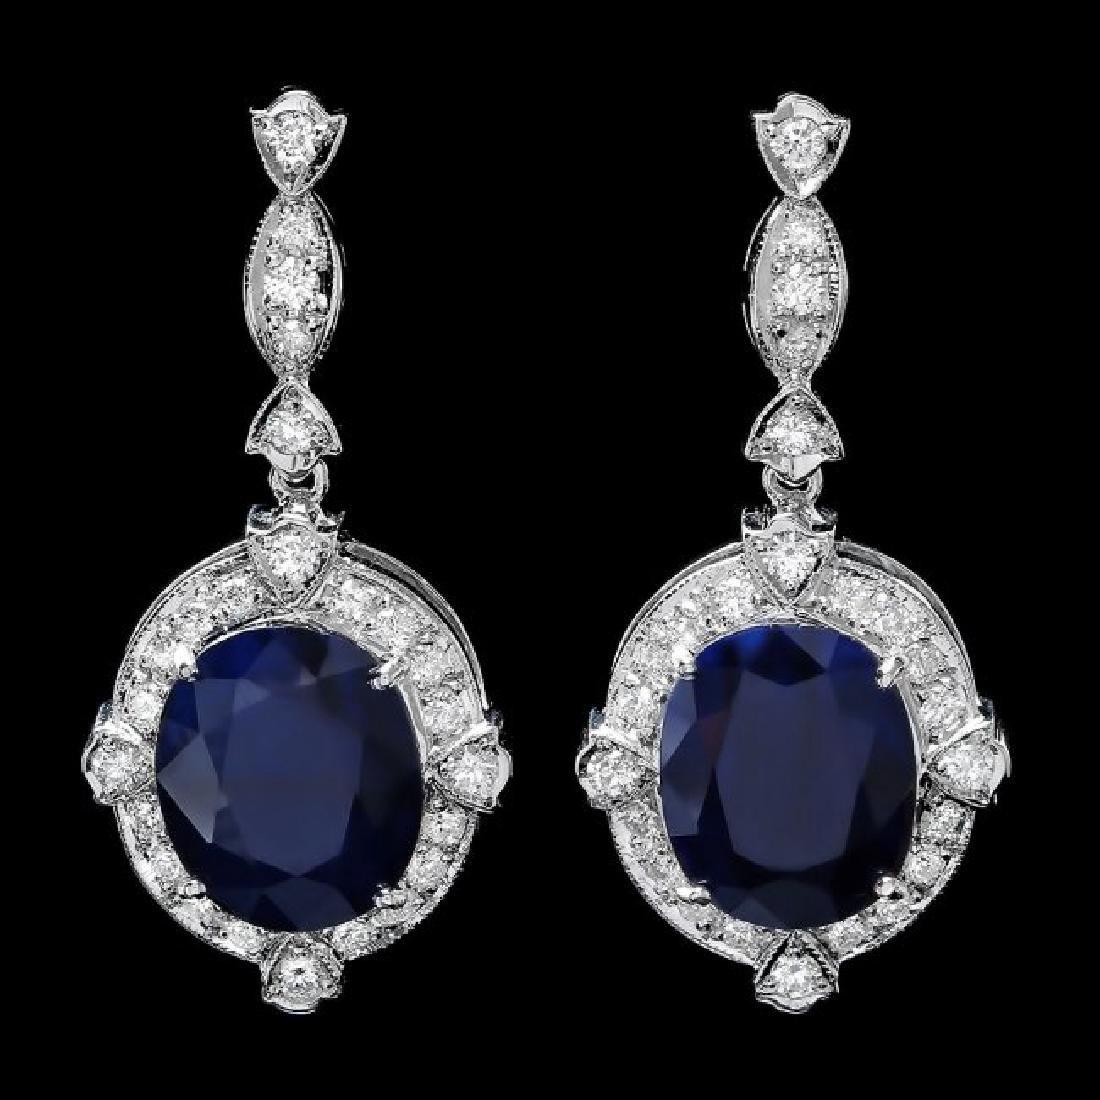 14k Gold 21ct Sapphire 1.70ct Diamond Earrings - 3